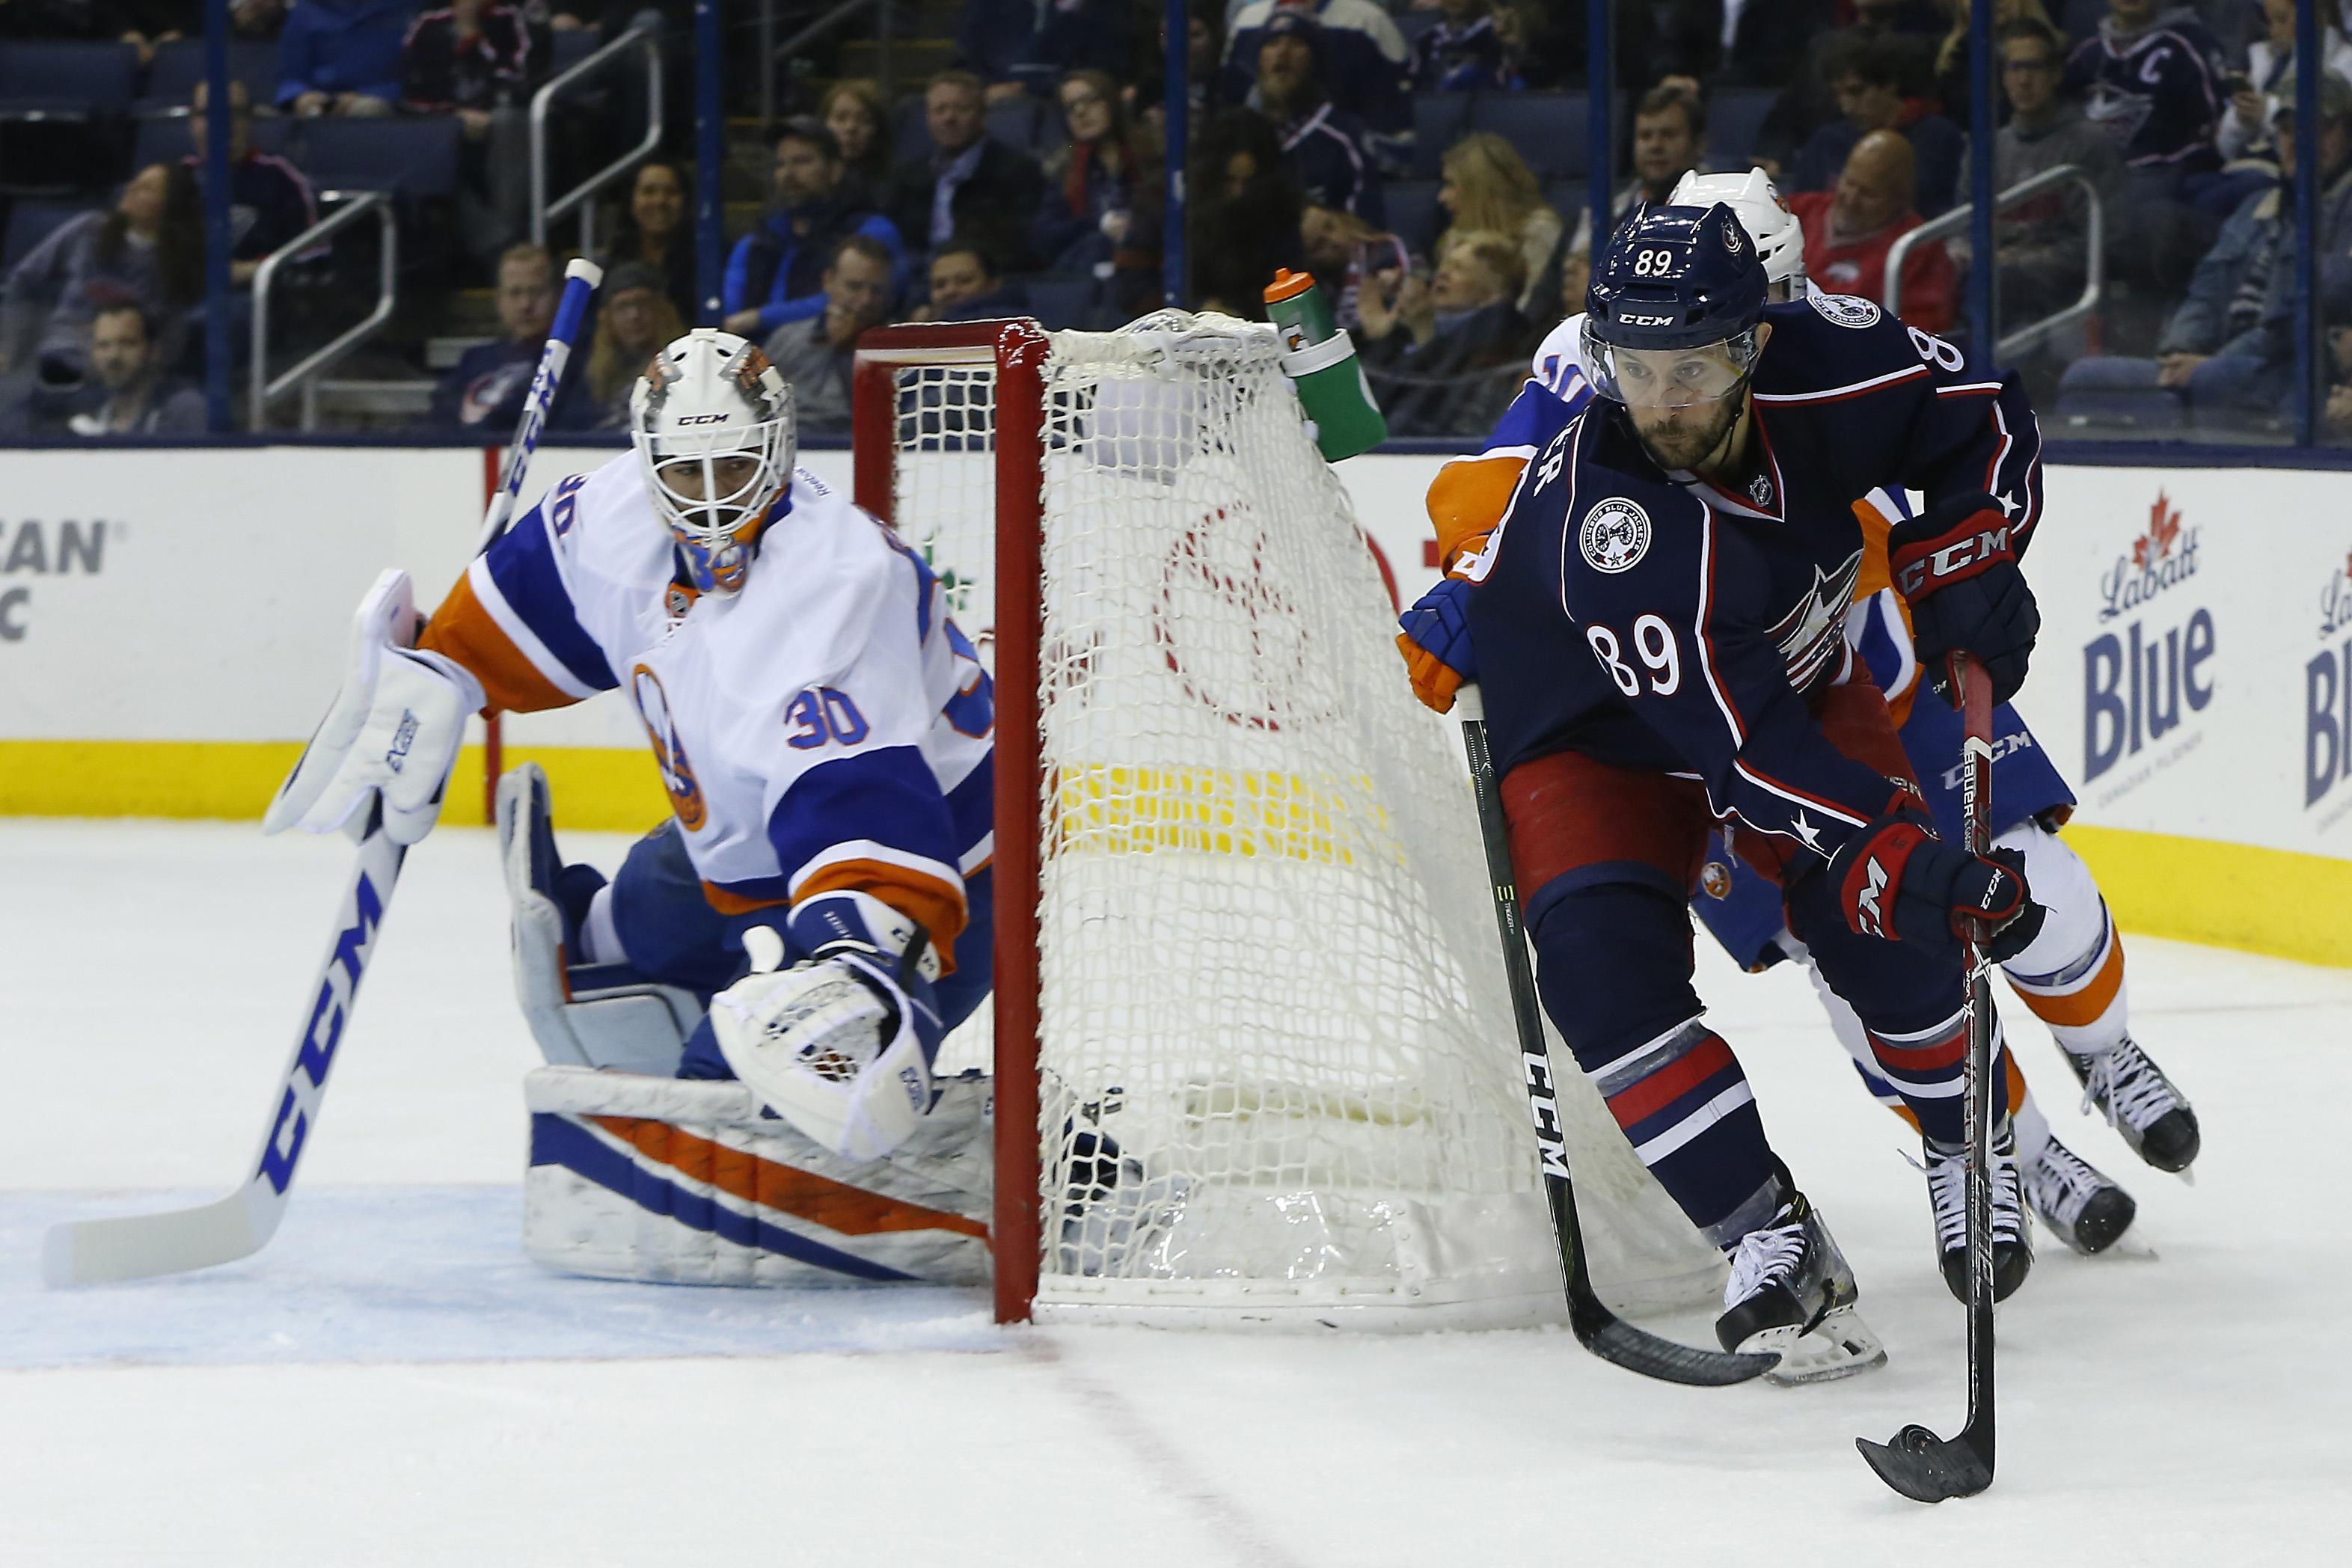 NHL: New York Islanders at Columbus Blue Jackets